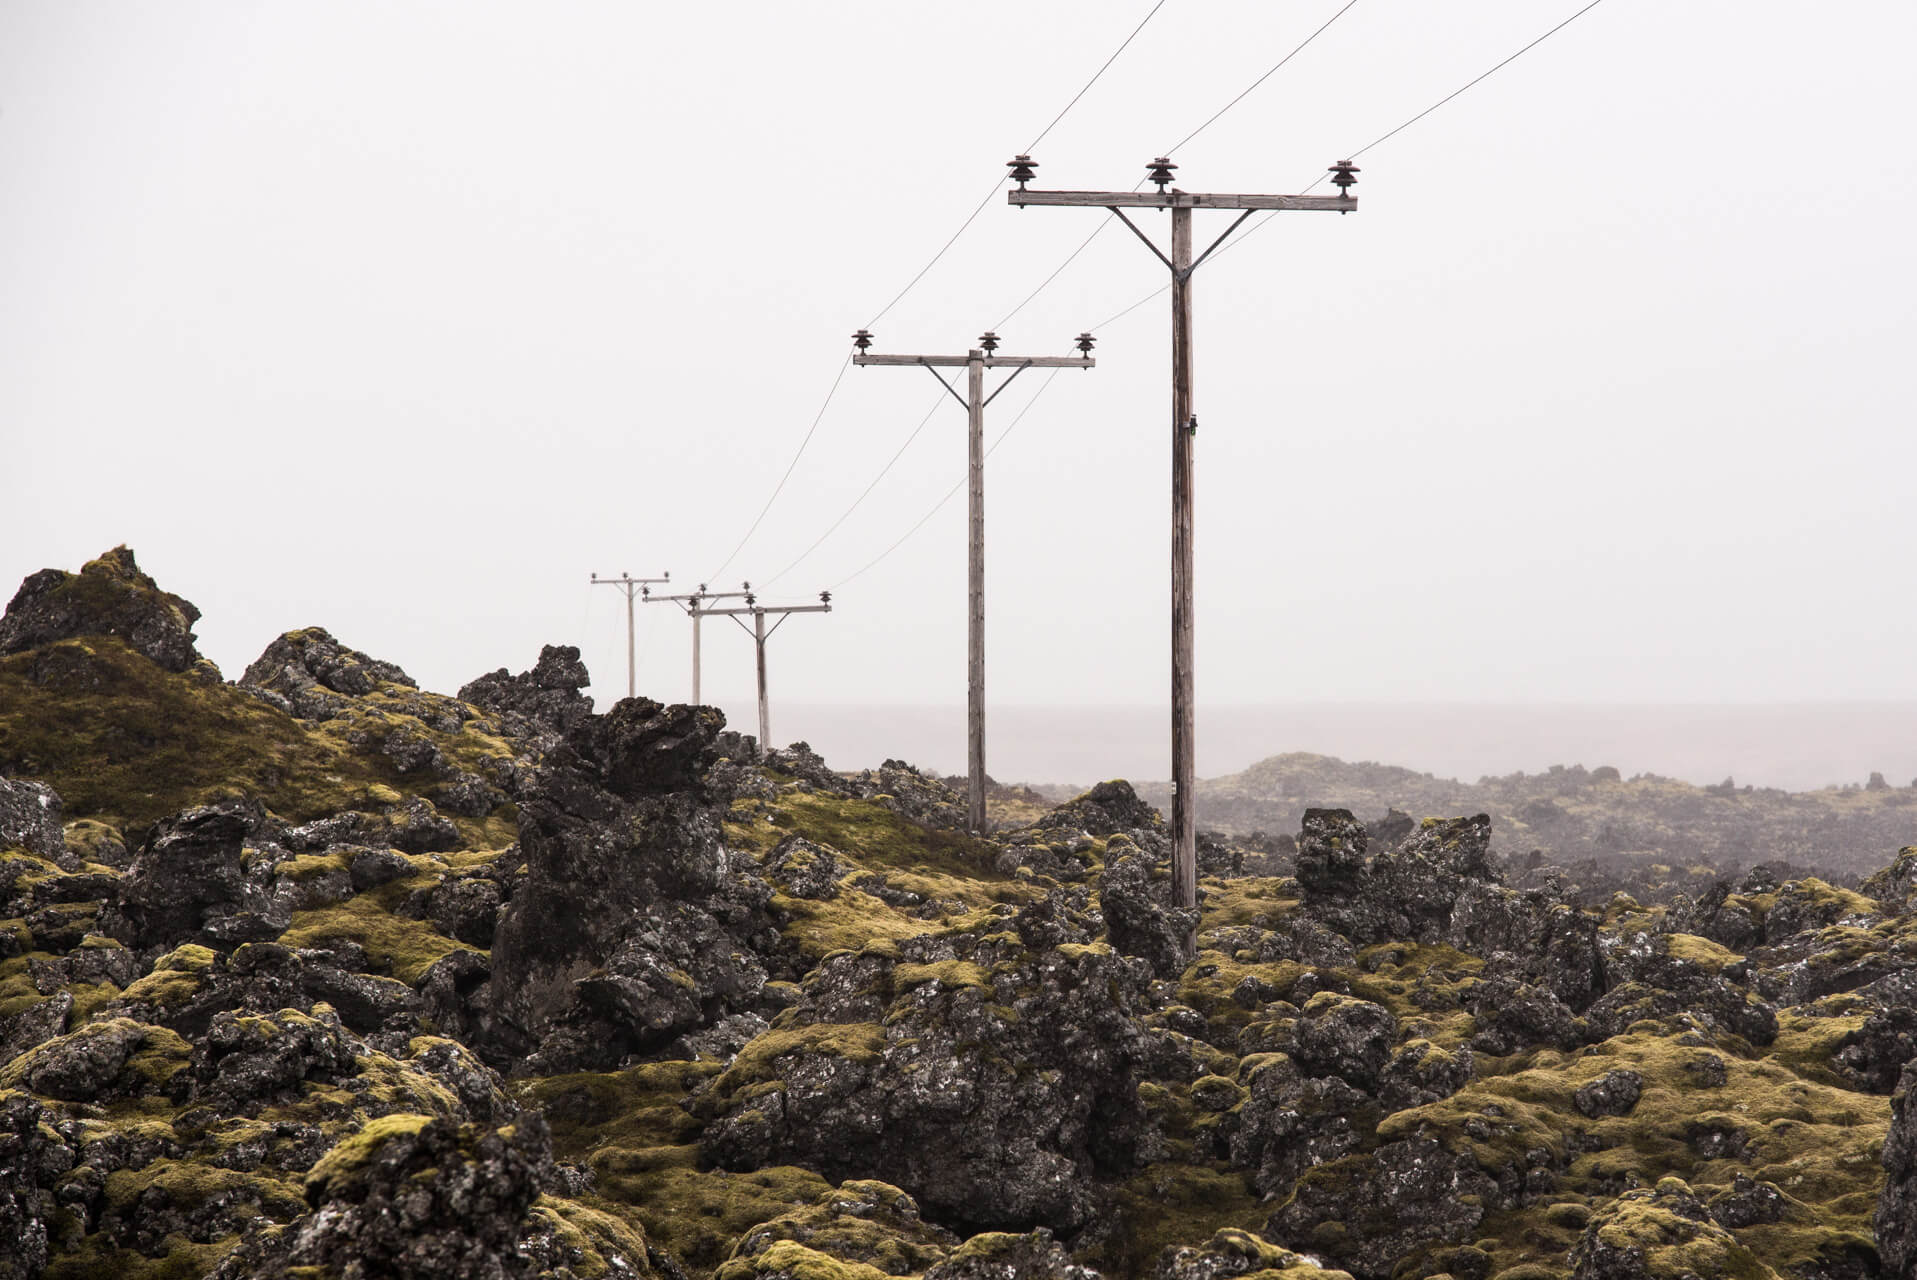 Island, Berserkerjahraun; Fotograf Steffen Lohse